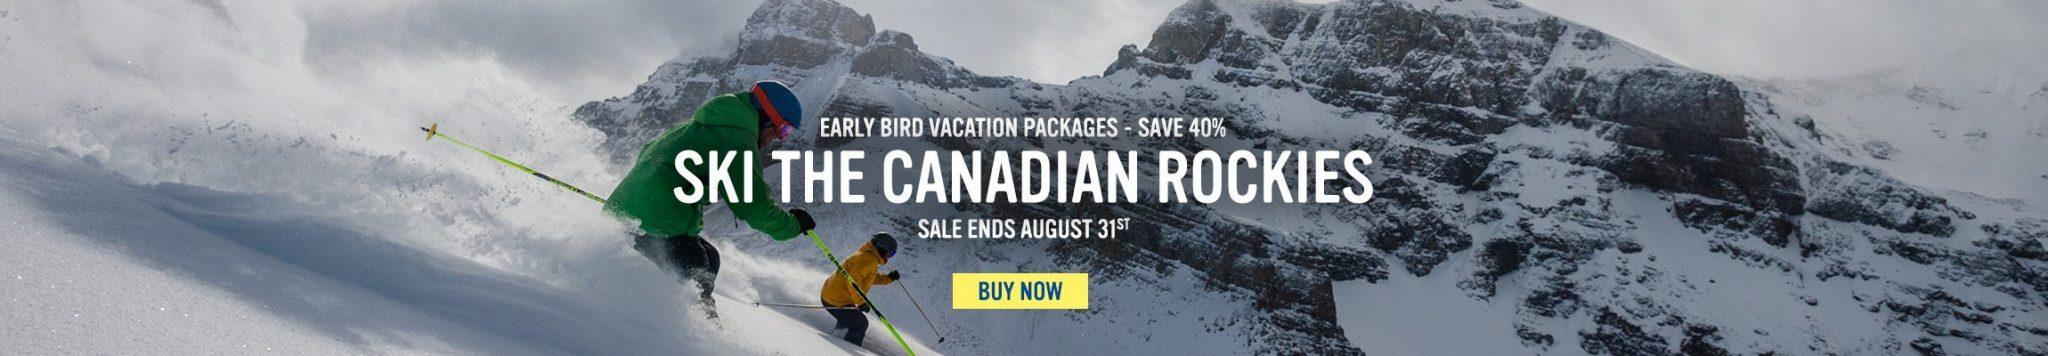 August 31 Sale